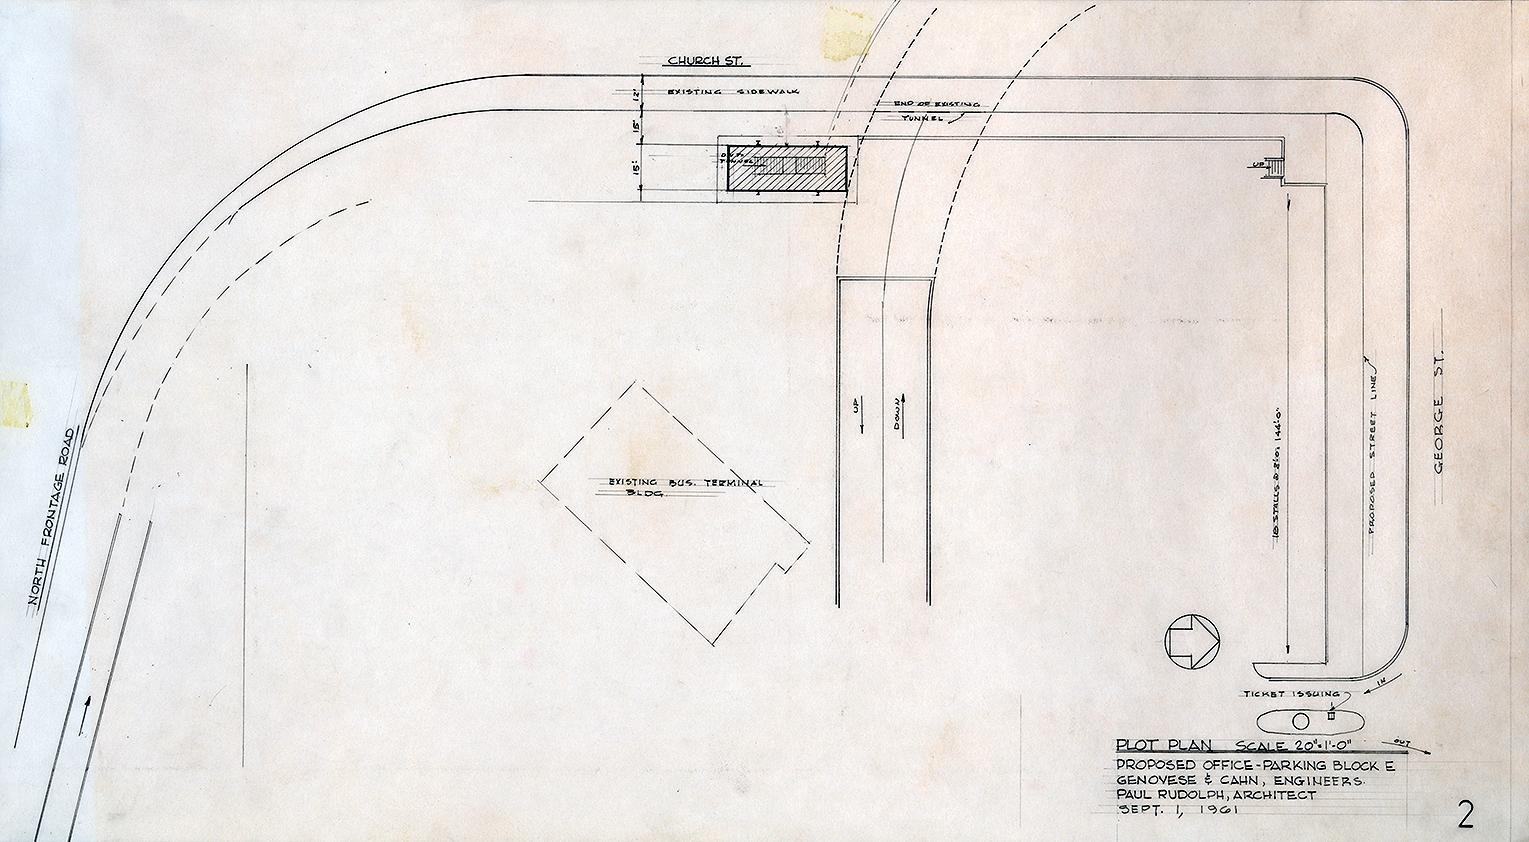 Manager's Office, Parking Garage,  New Haven, Connecticut. Scheme A. Plot Plan.